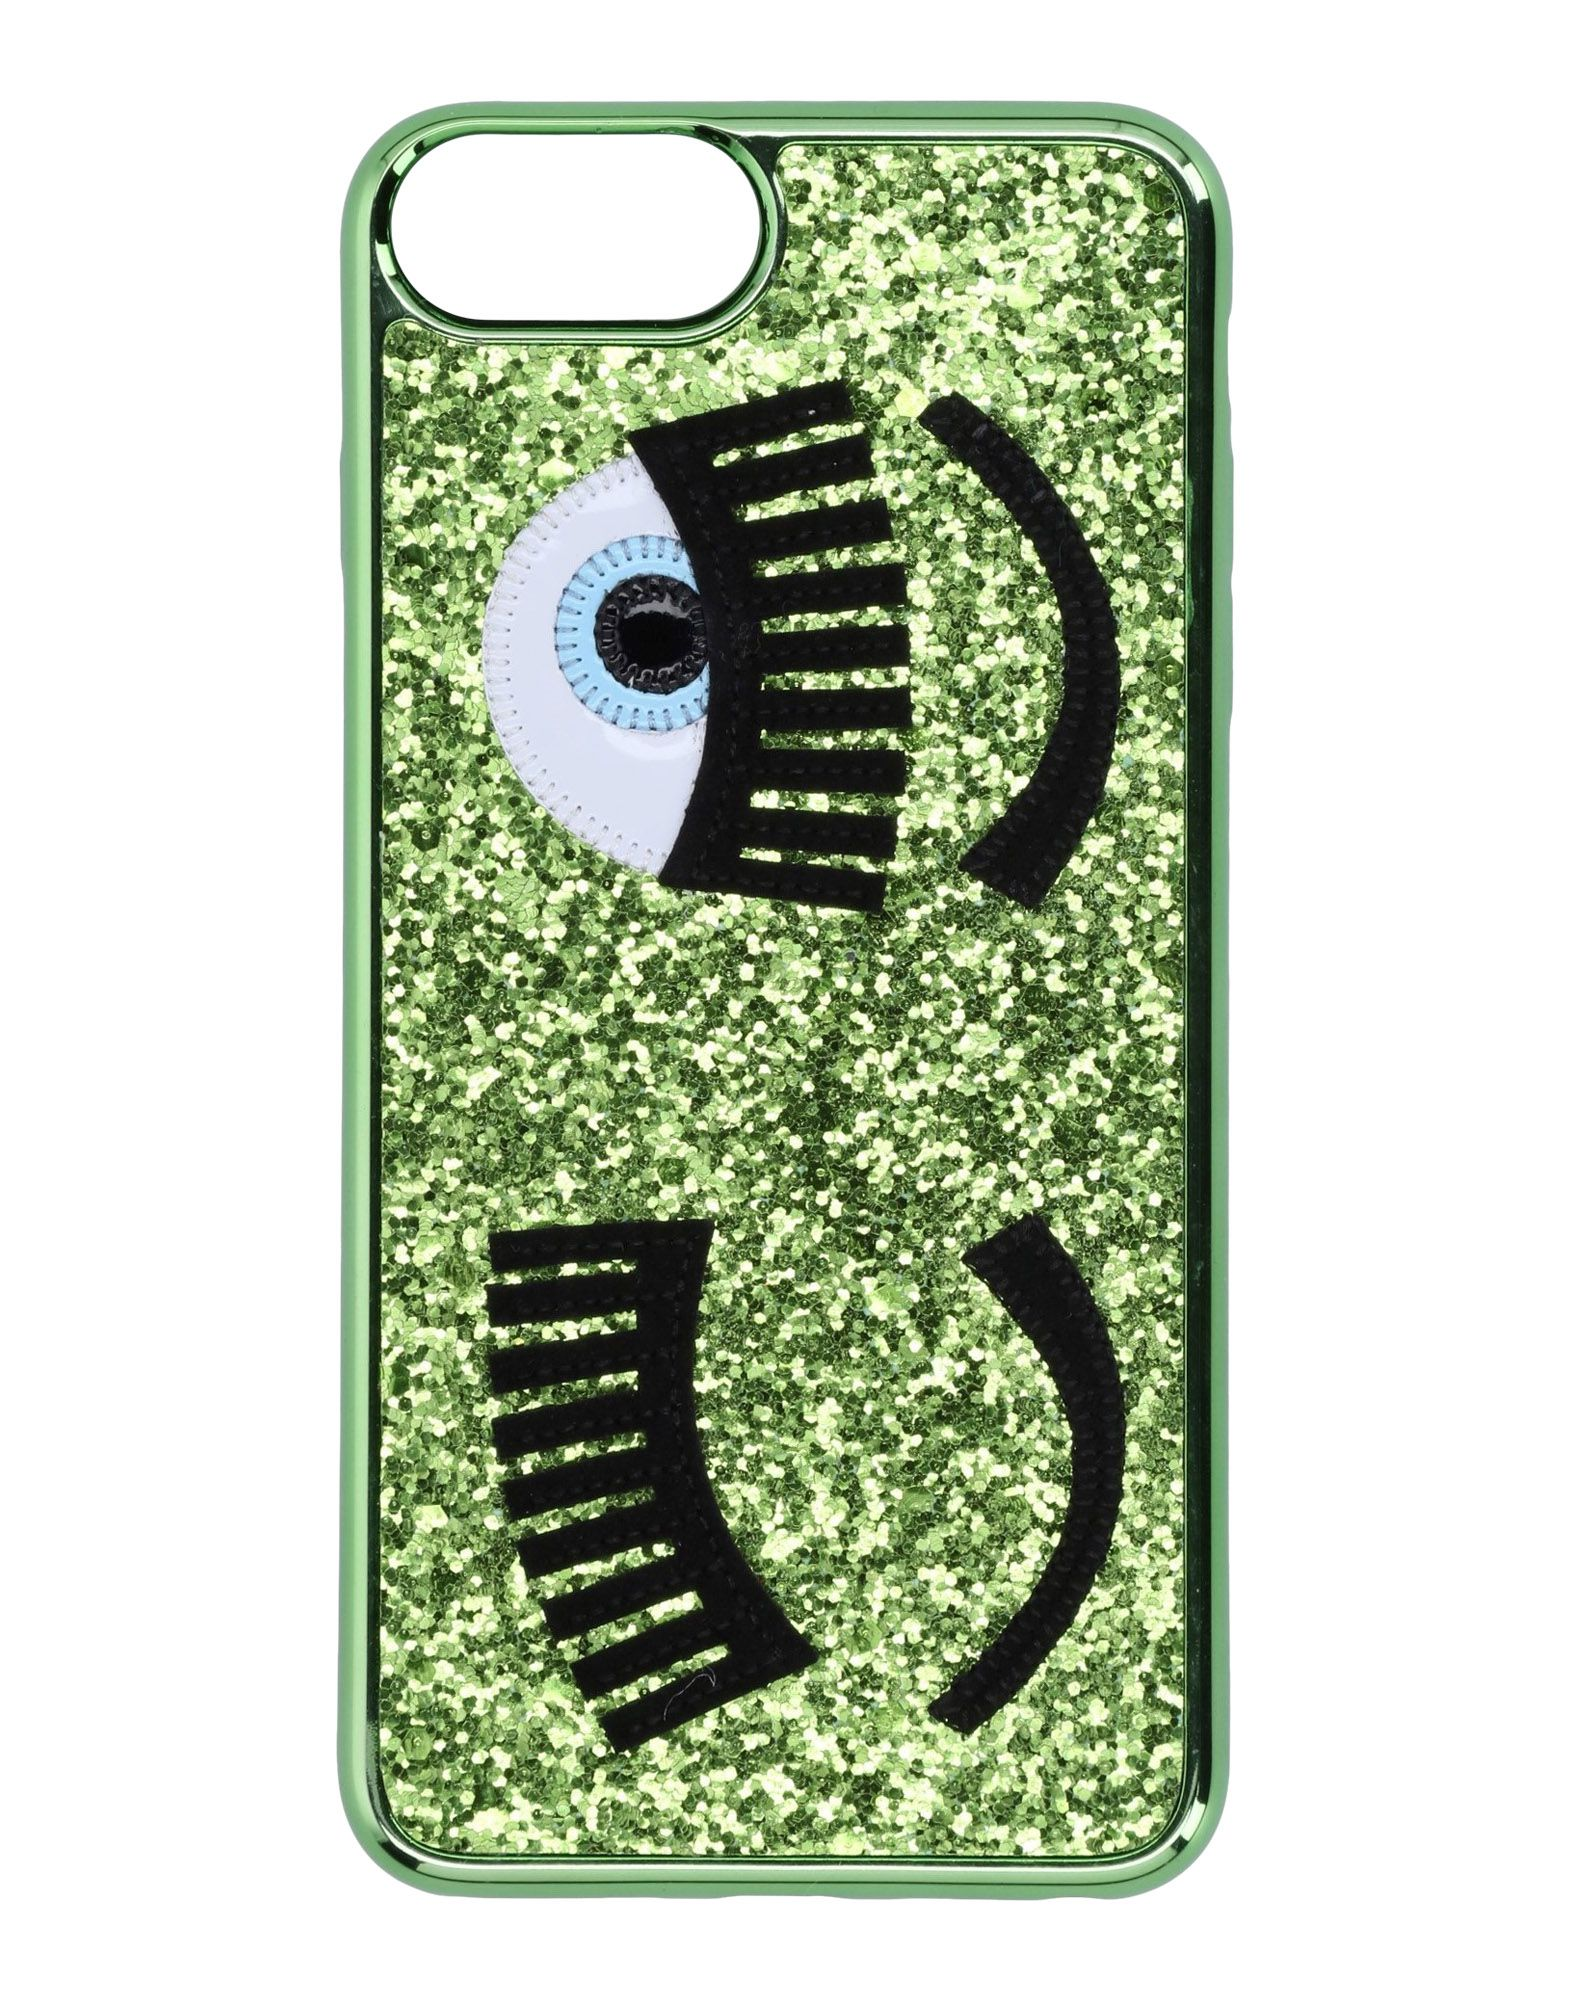 CHIARA FERRAGNI Чехол чехол накладка для iphone 5 5s 6 6s 6plus 6s plus змеиный дизайн